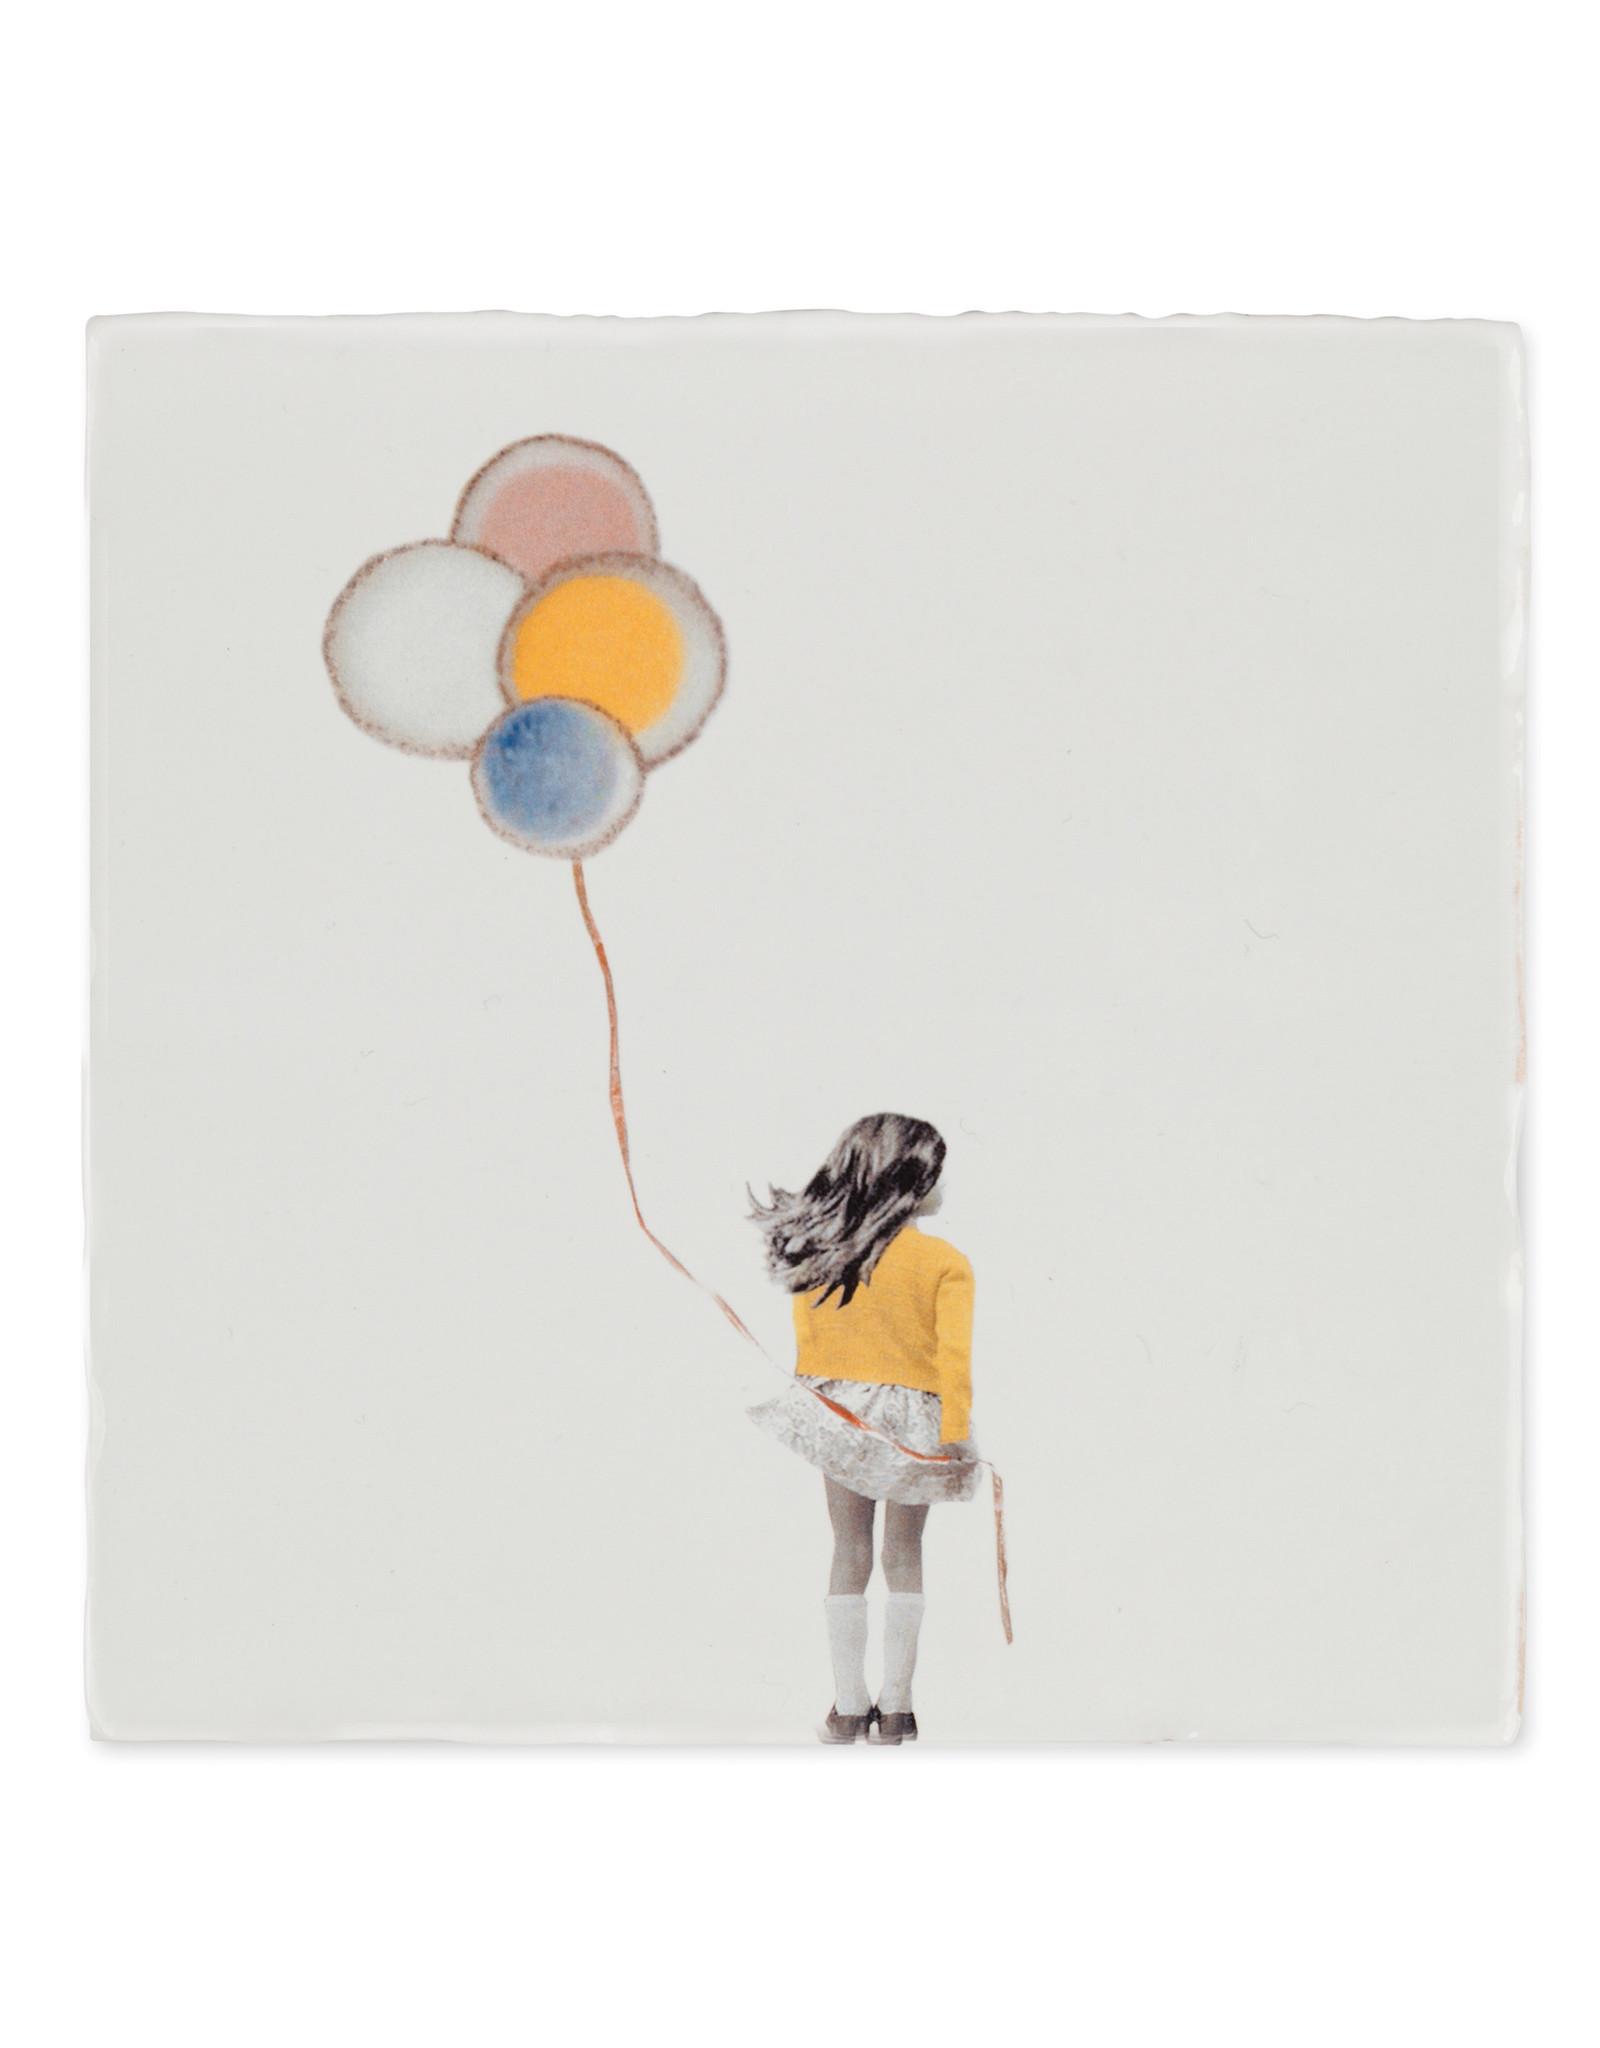 Storytiles Tegel - Een wensballon